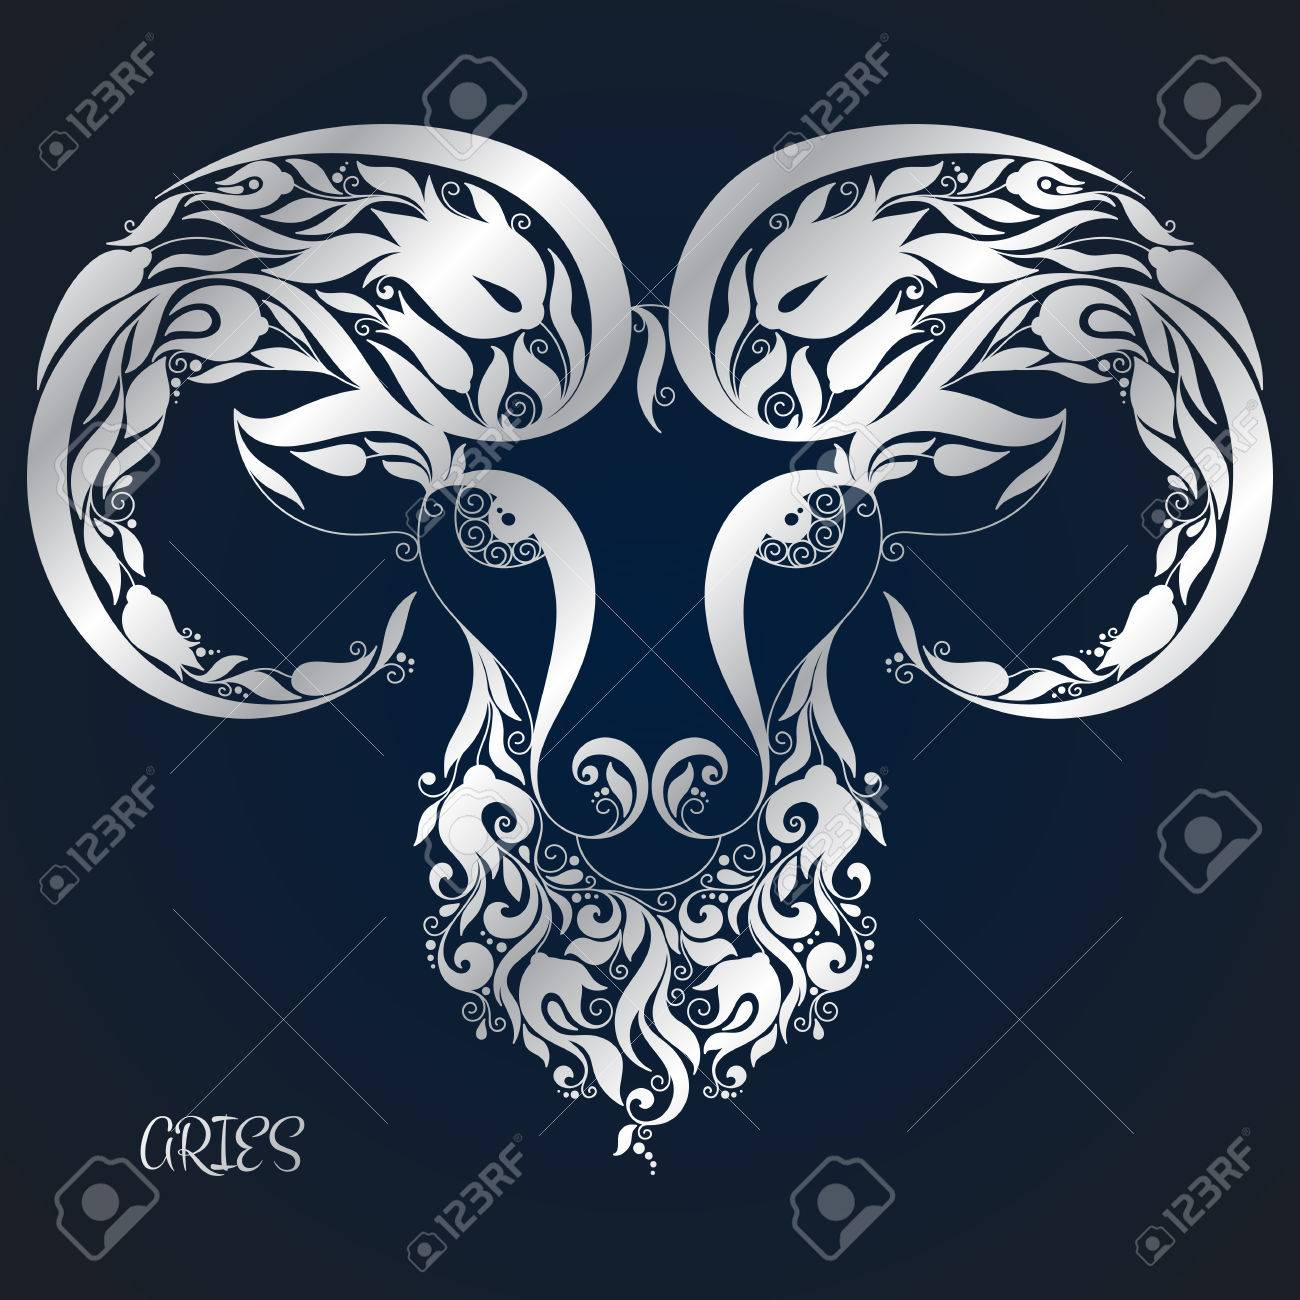 Aries. Astrology Zodiac sign. Vector zodiac. Hand drawn style. - 51119729